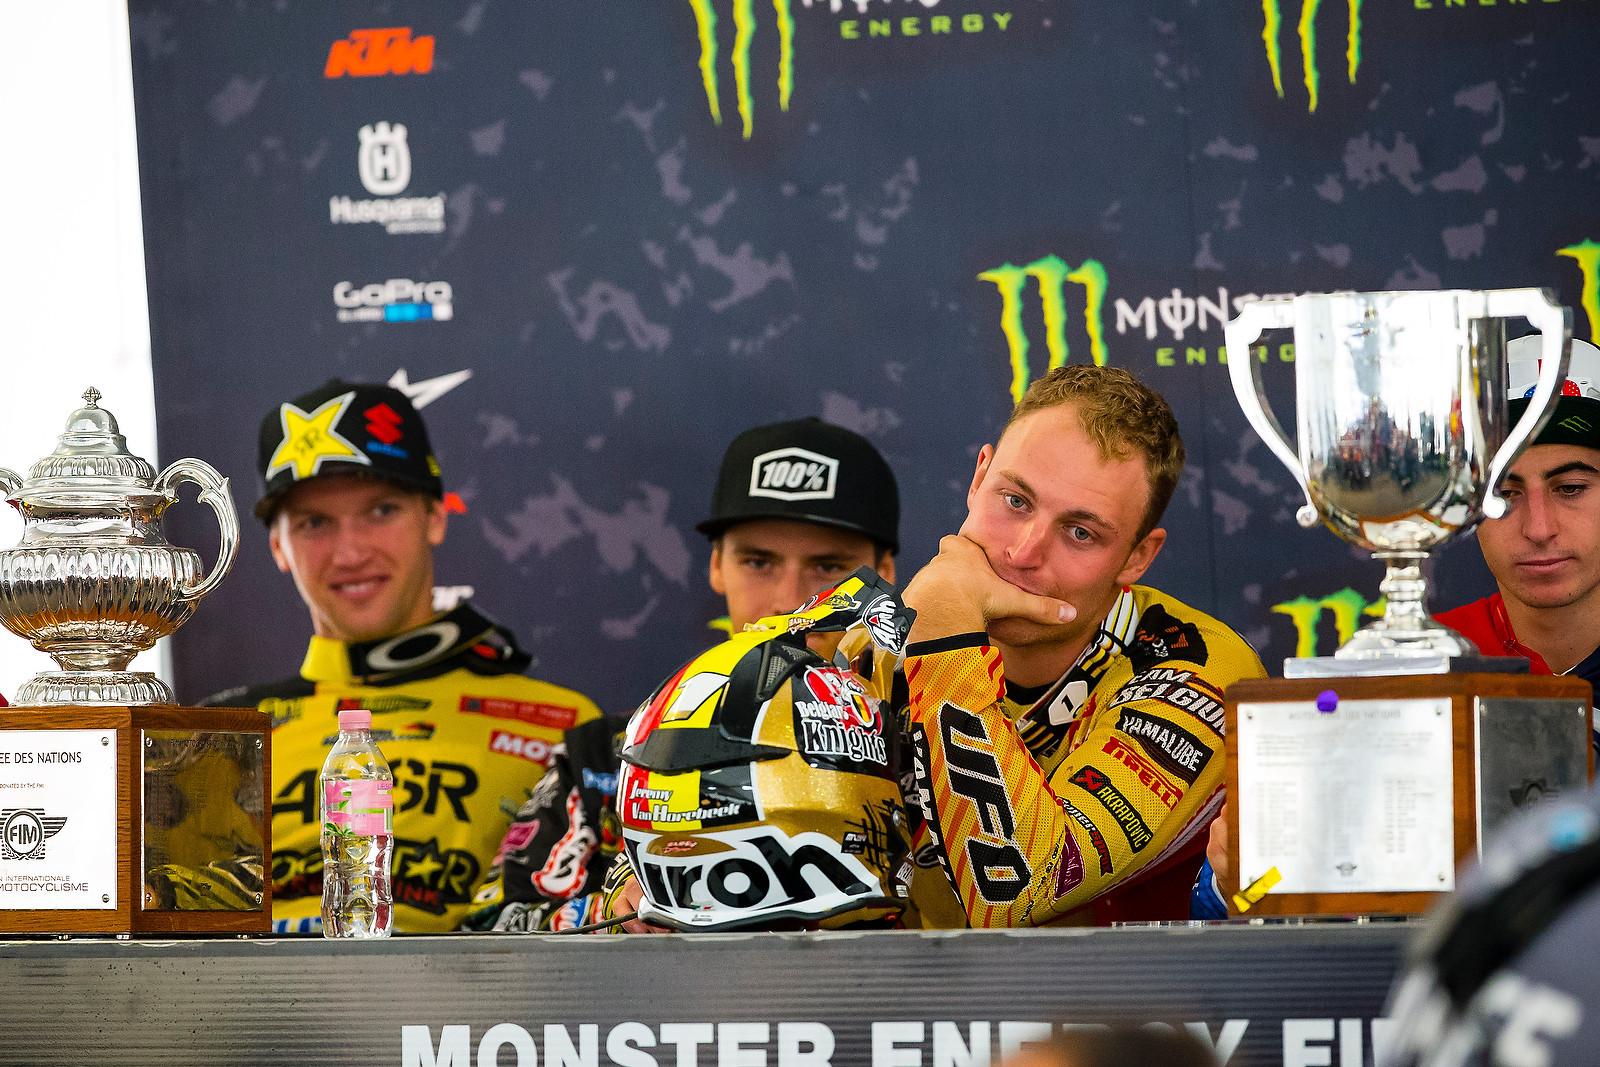 No fun - kardy - Motocross Pictures - Vital MX